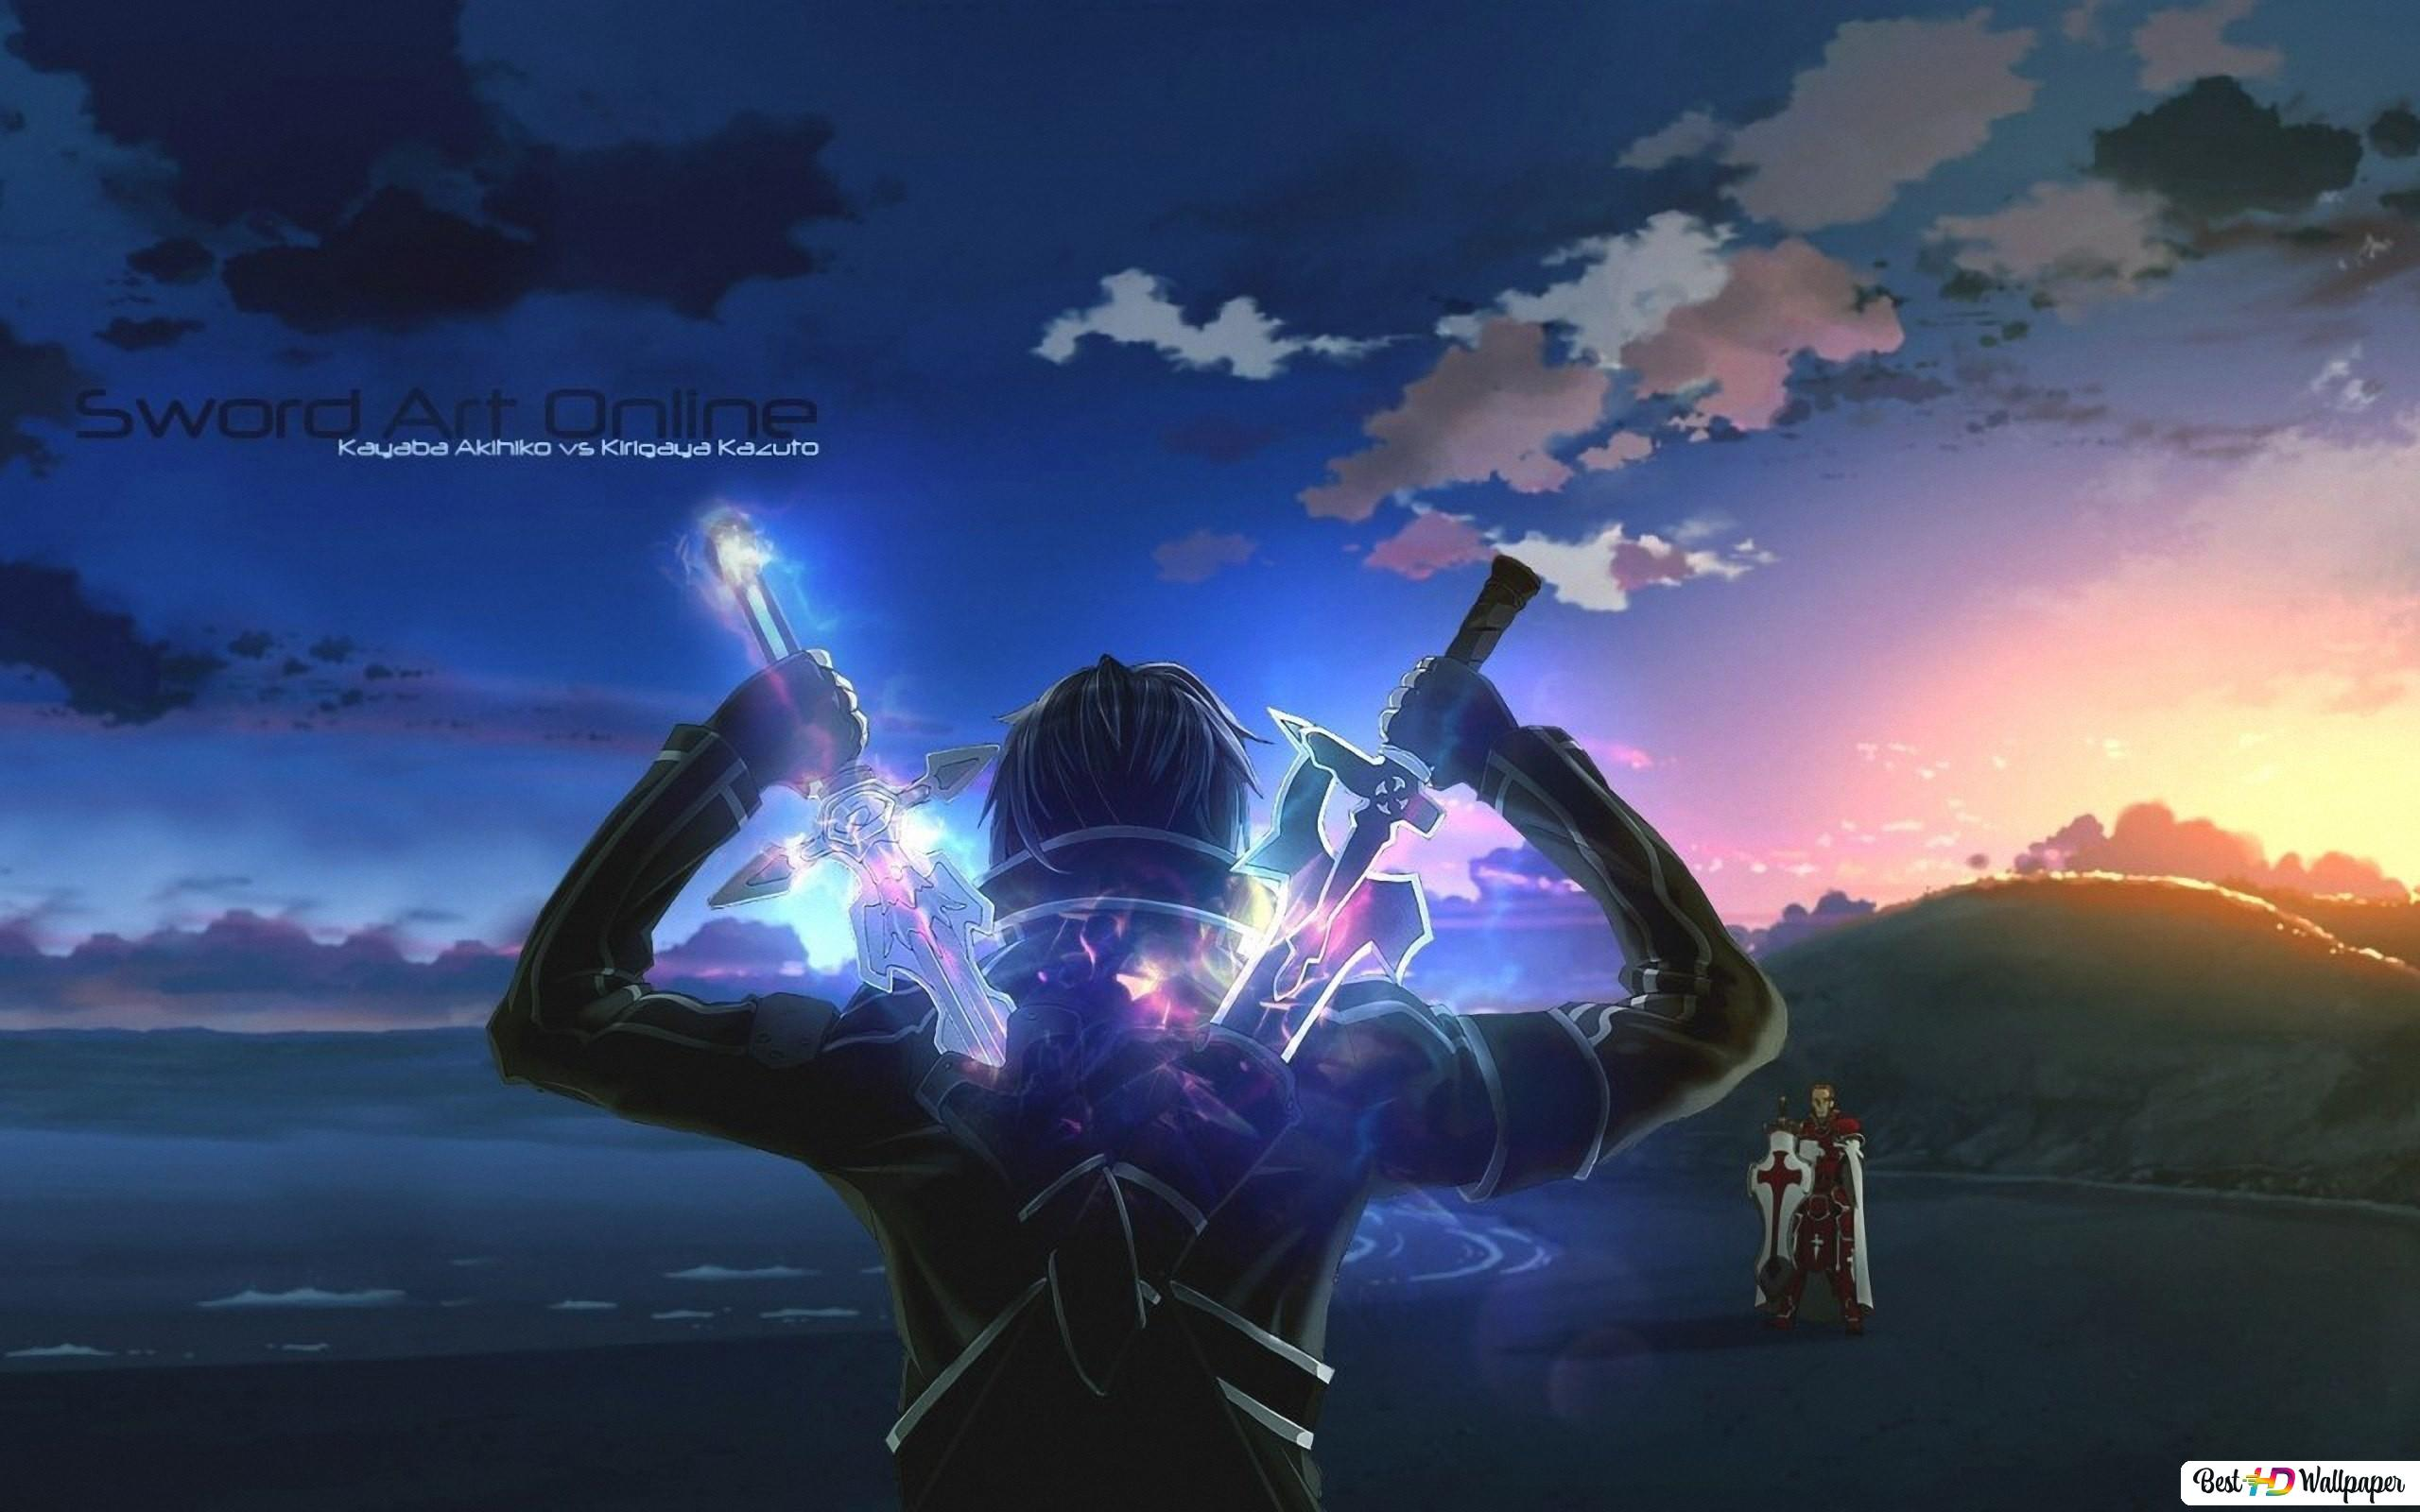 Sword Art Online Kirito Vs Heathcliff Hd Hintergrundbilder